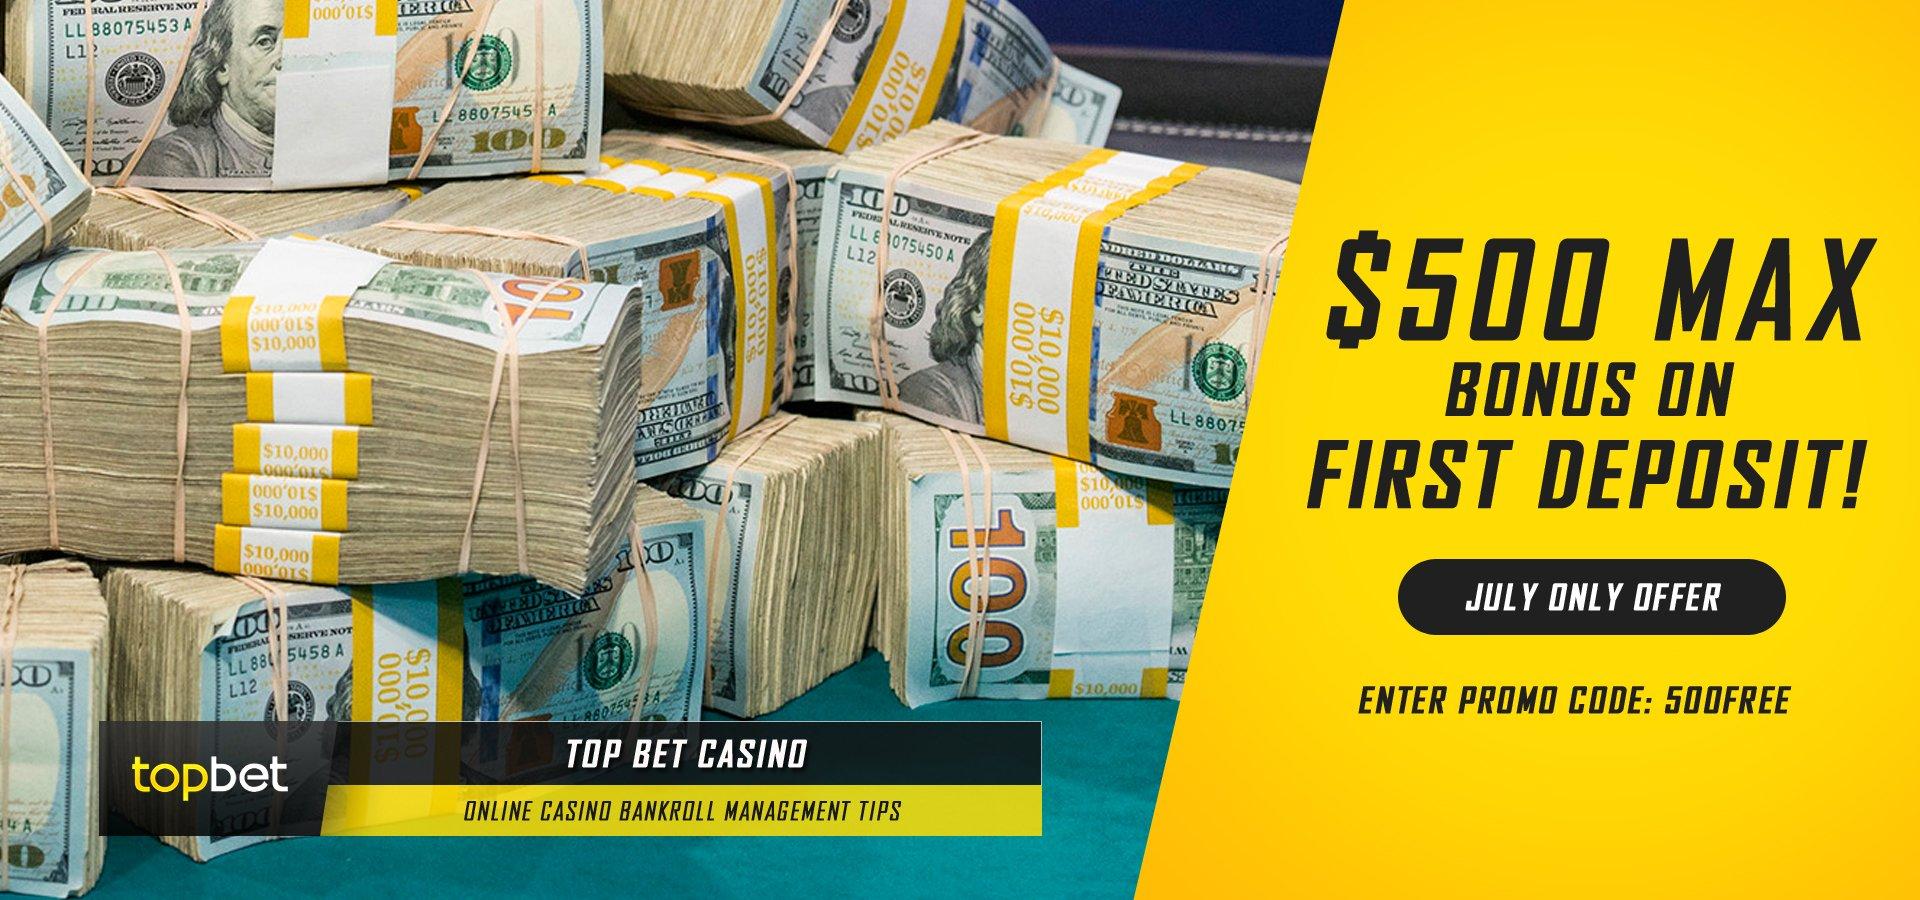 Bankroll Management Casino -376582